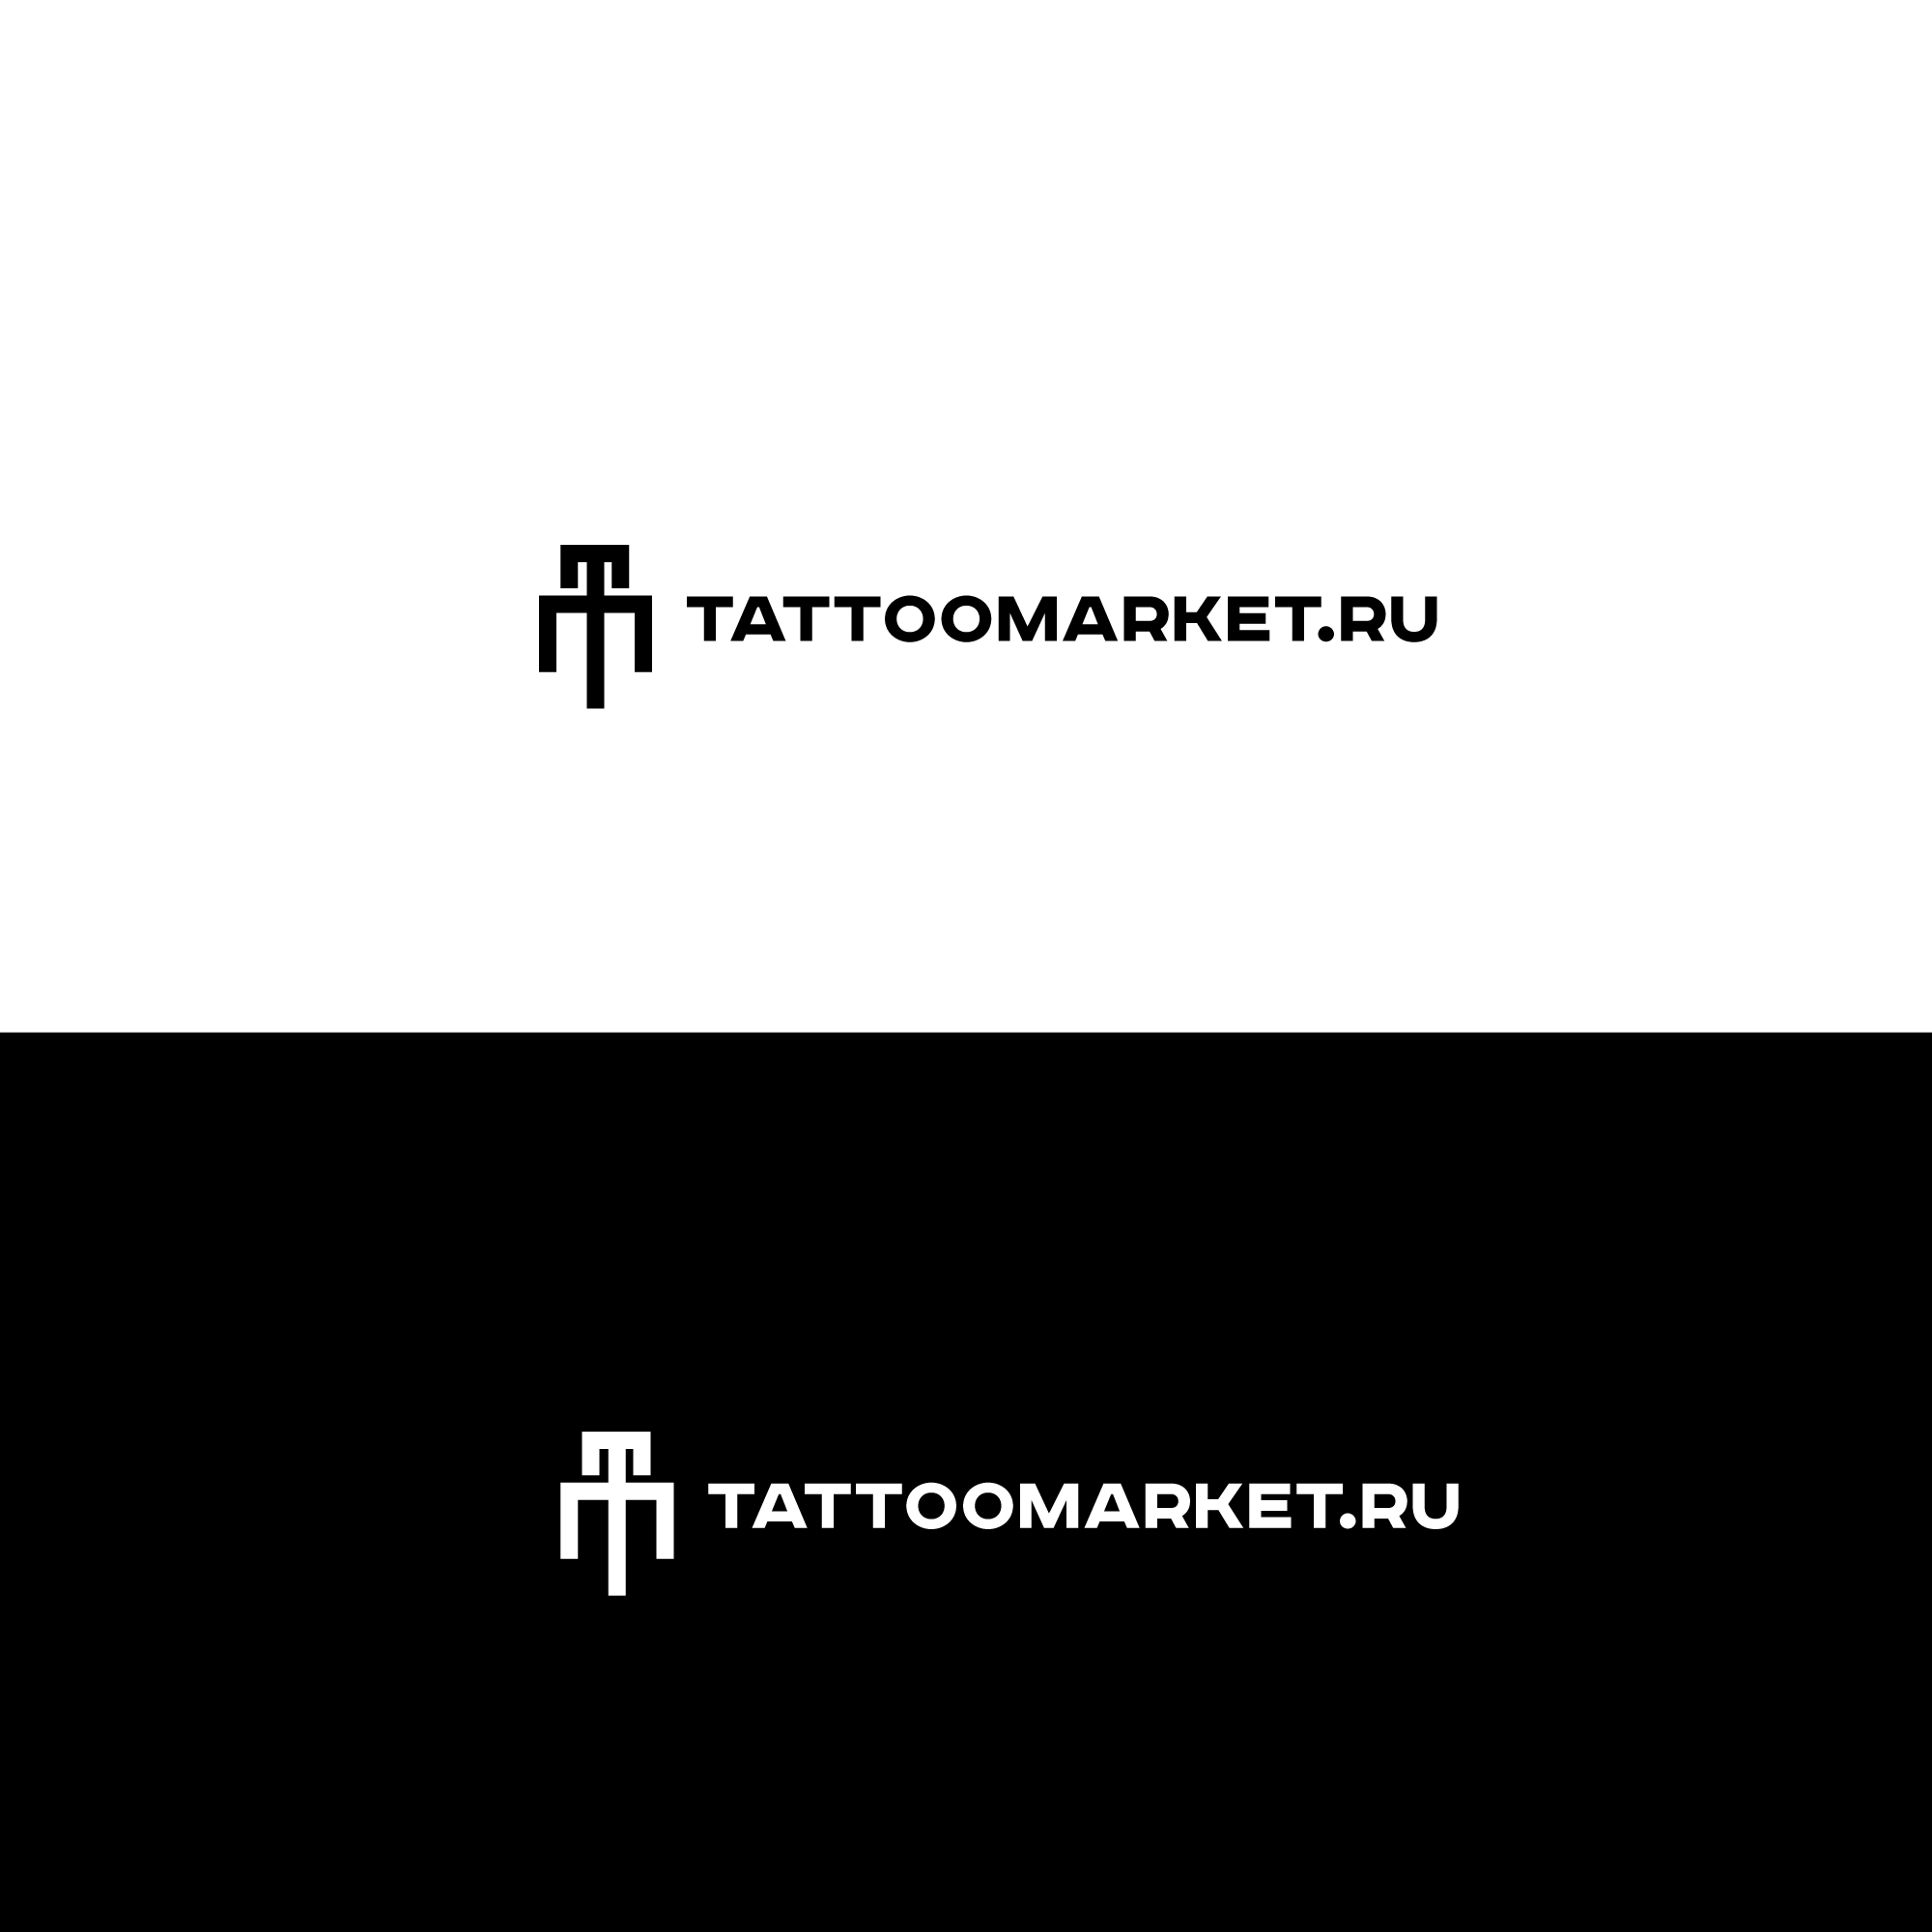 Редизайн логотипа магазина тату оборудования TattooMarket.ru фото f_0415c401c93f06d4.jpg